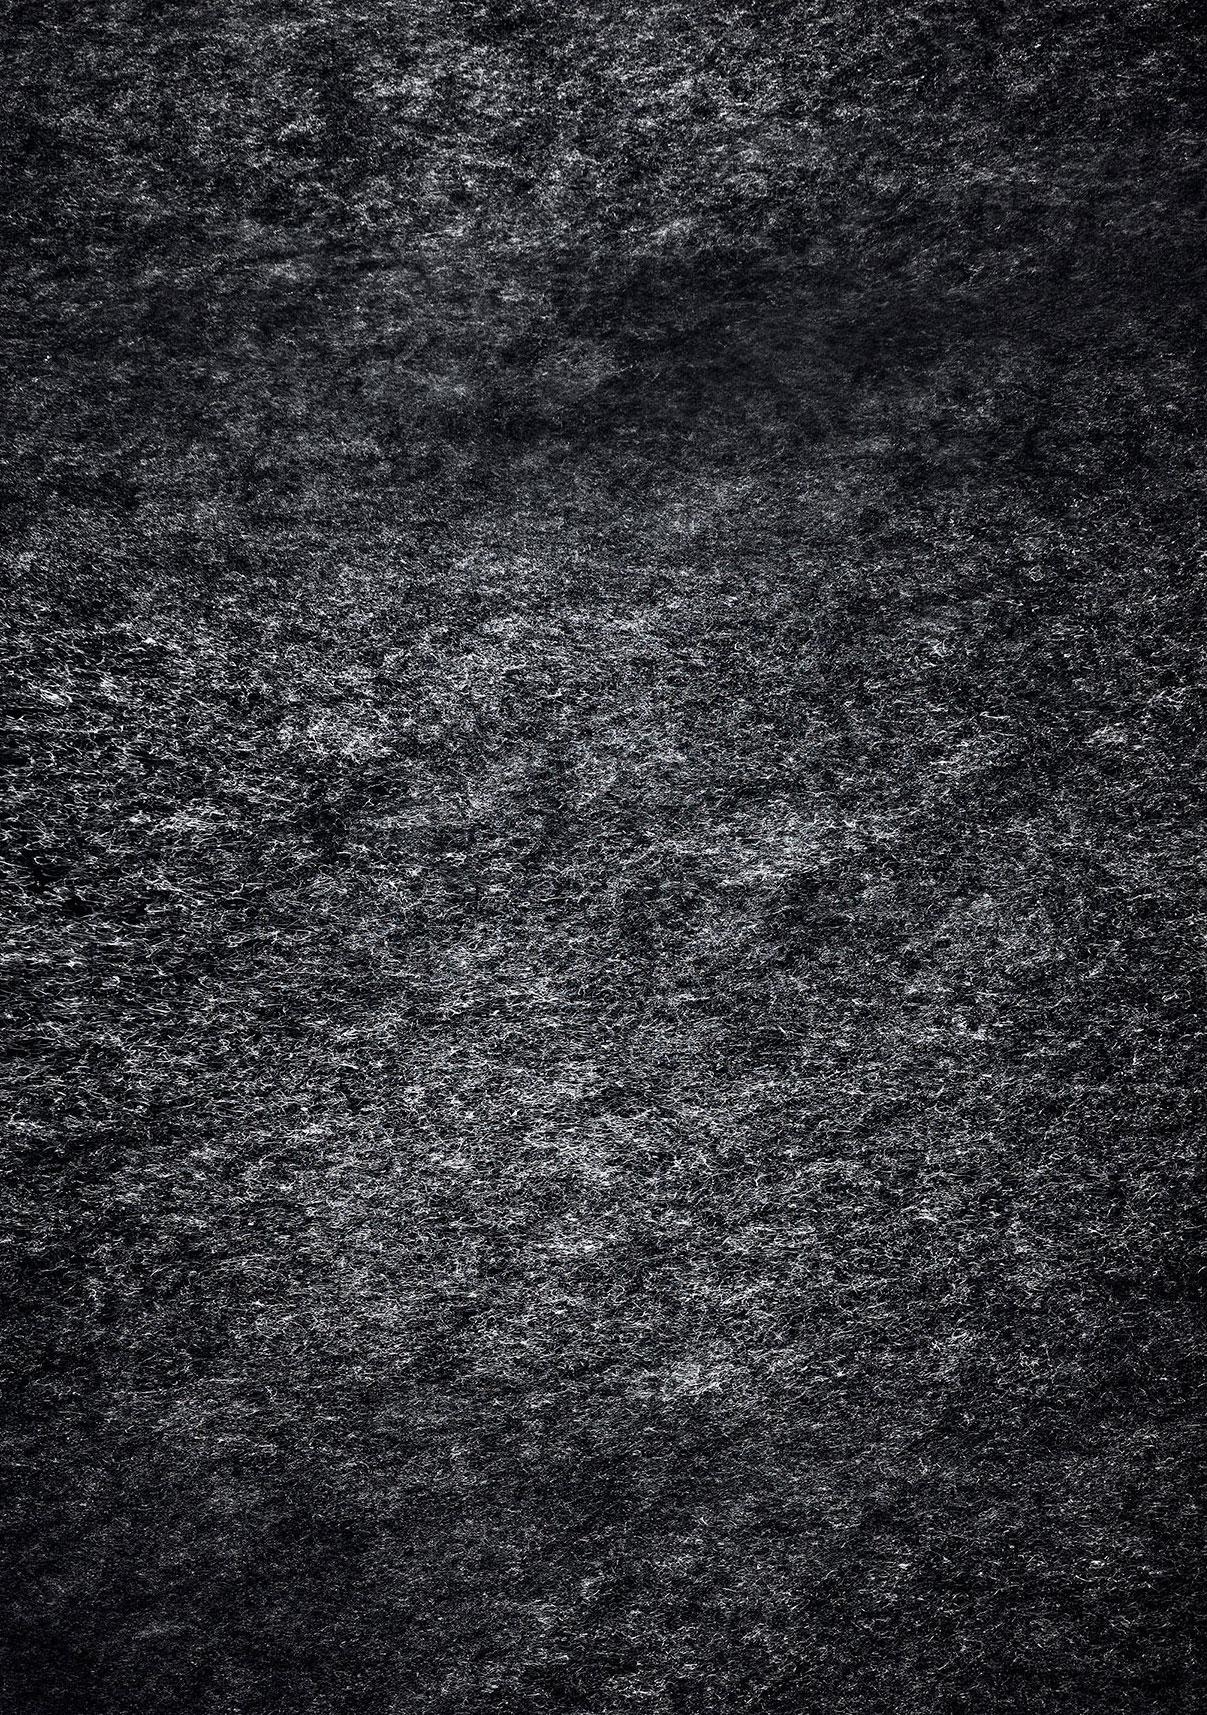 Gravity-Field-#8473-·-2017-·-unique-C-print-·-244-x-180-cm